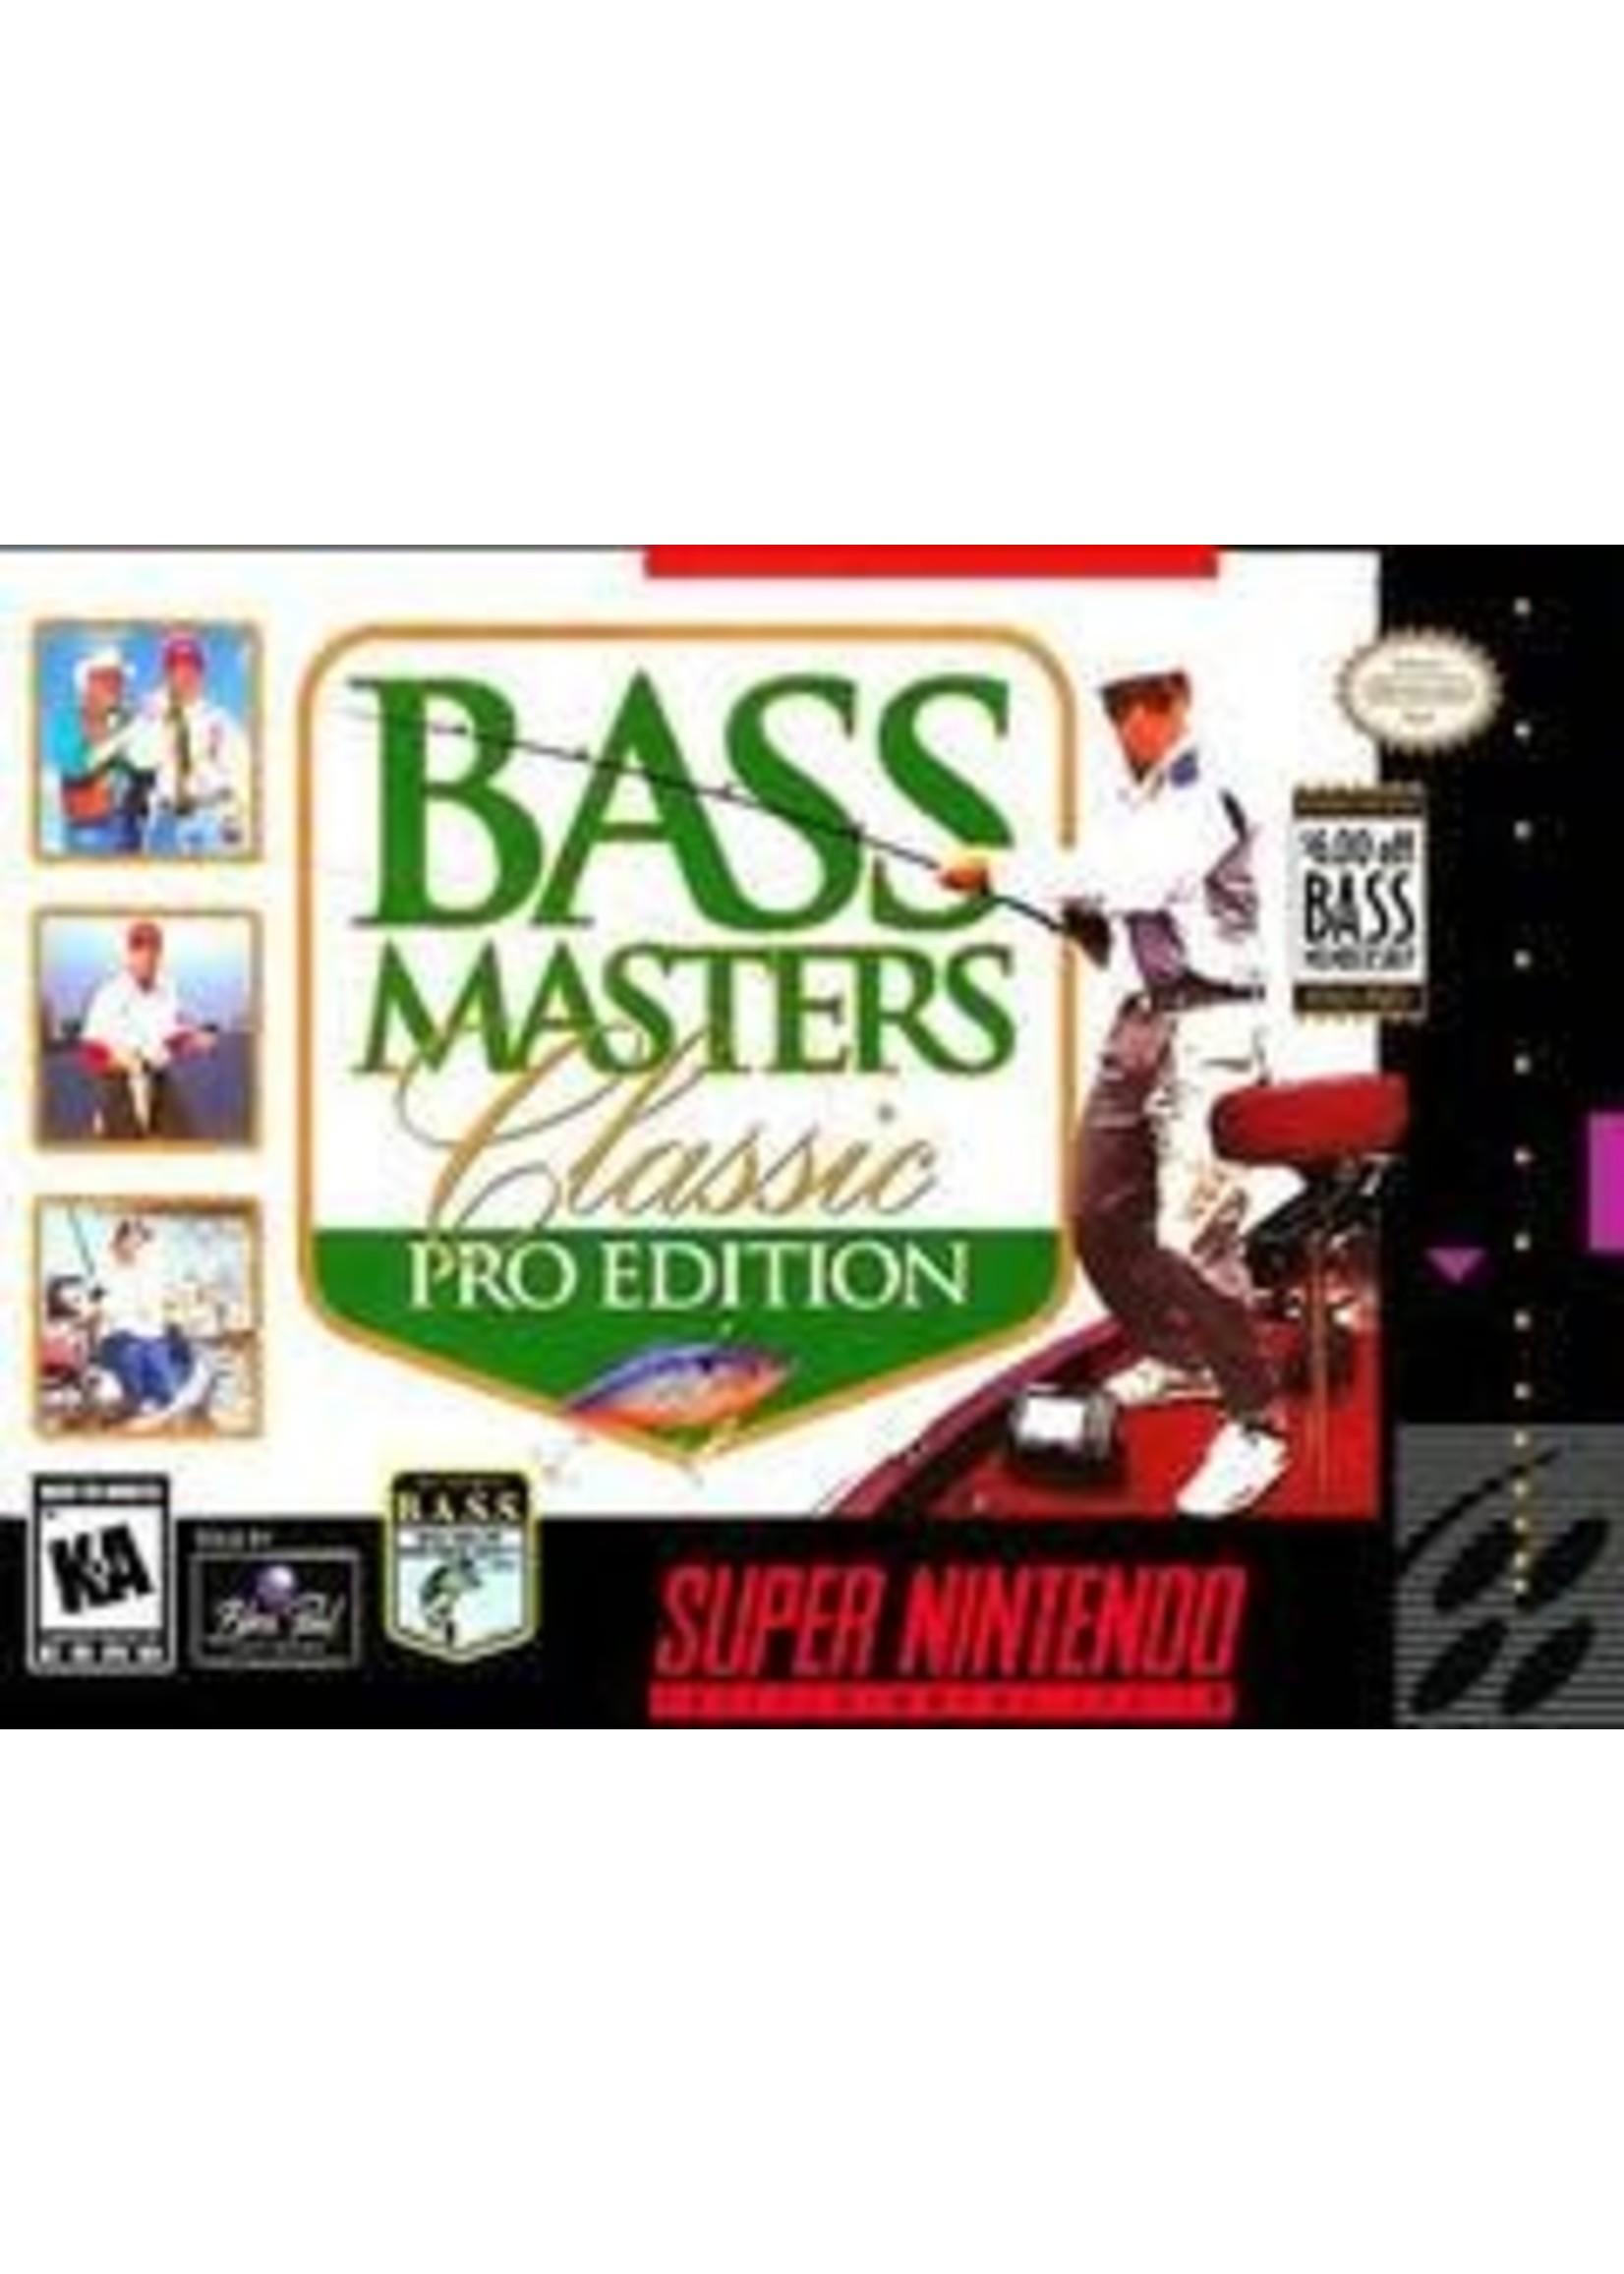 Bass Masters Classic Pro Edition Super Nintendo